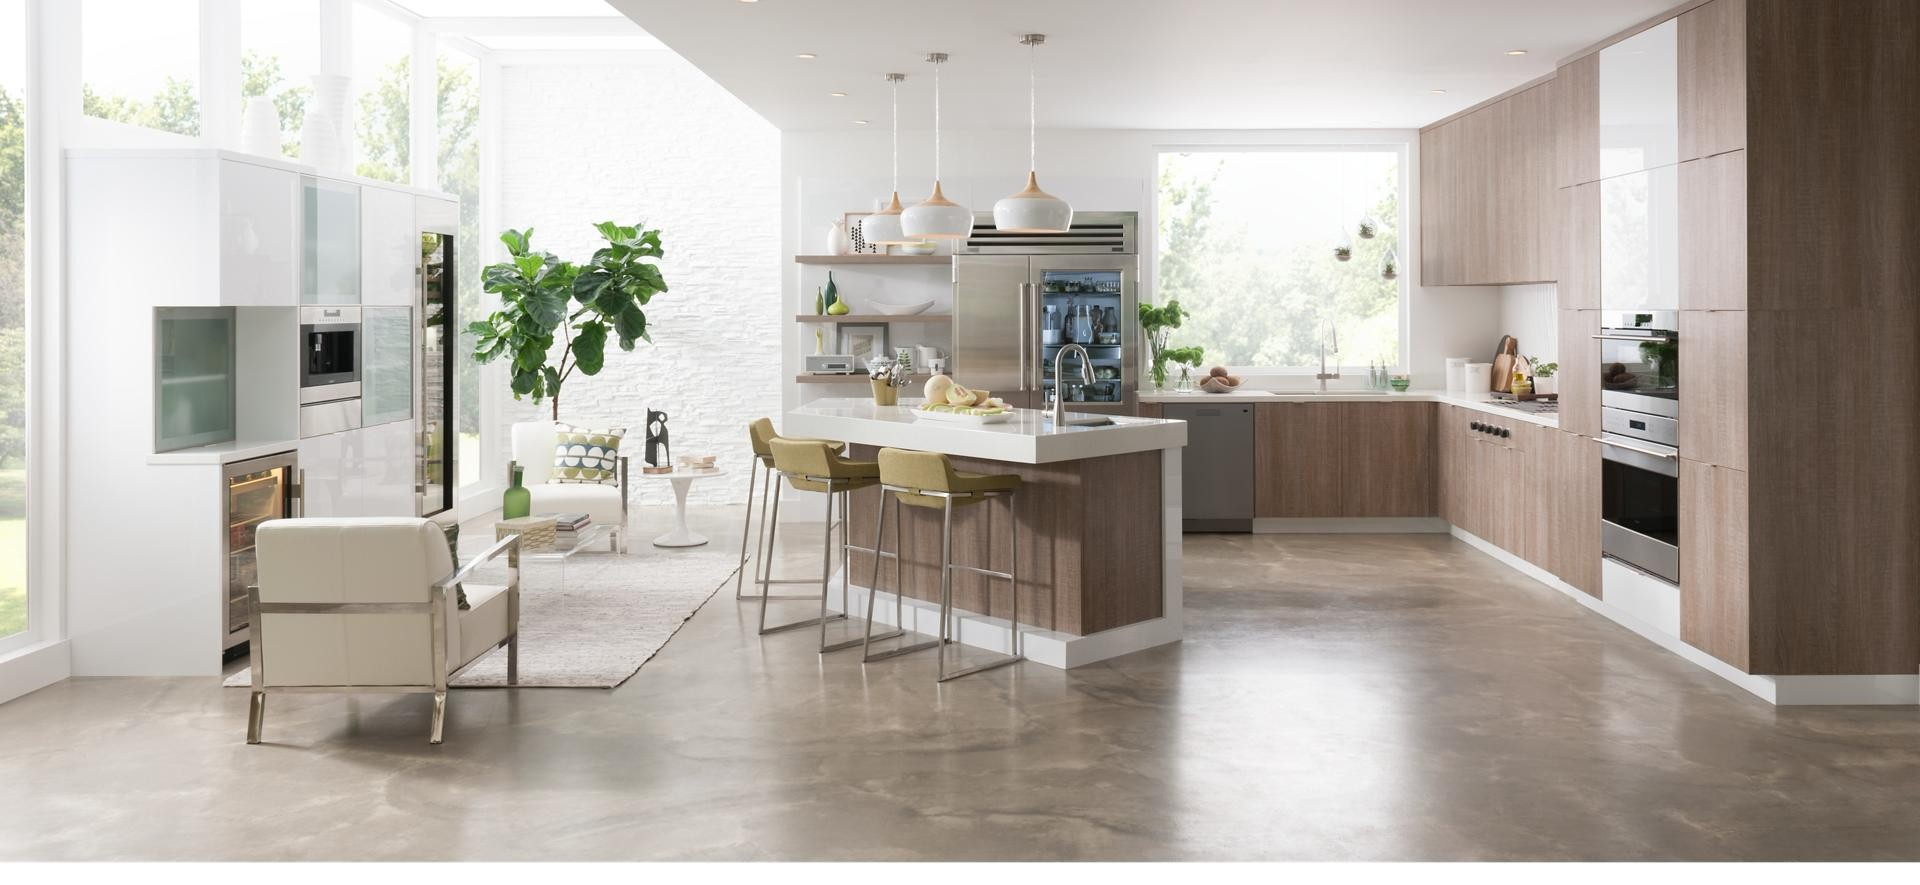 China Best Quality Laminate Melamine Kitchen Cabinet Price